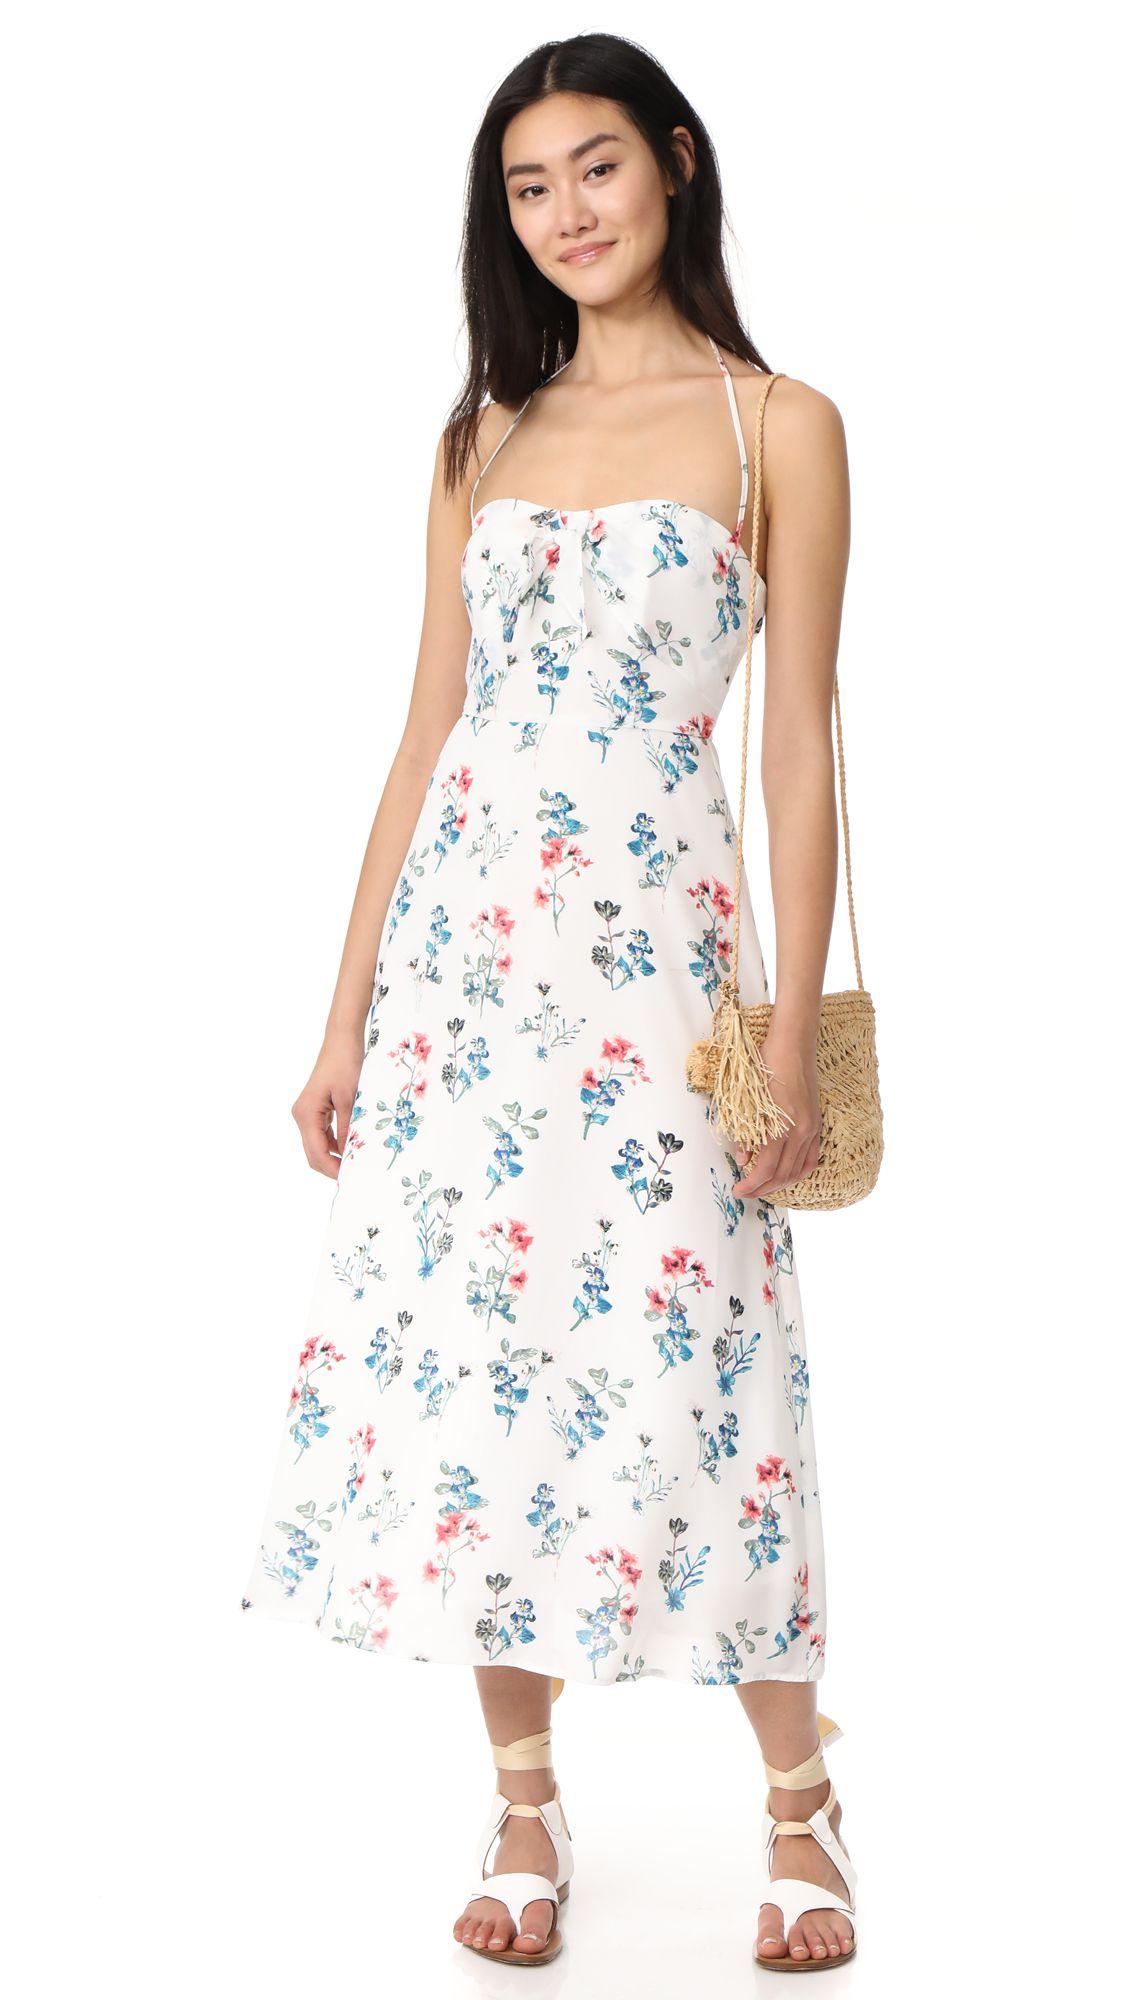 A model wearing a floral sundress